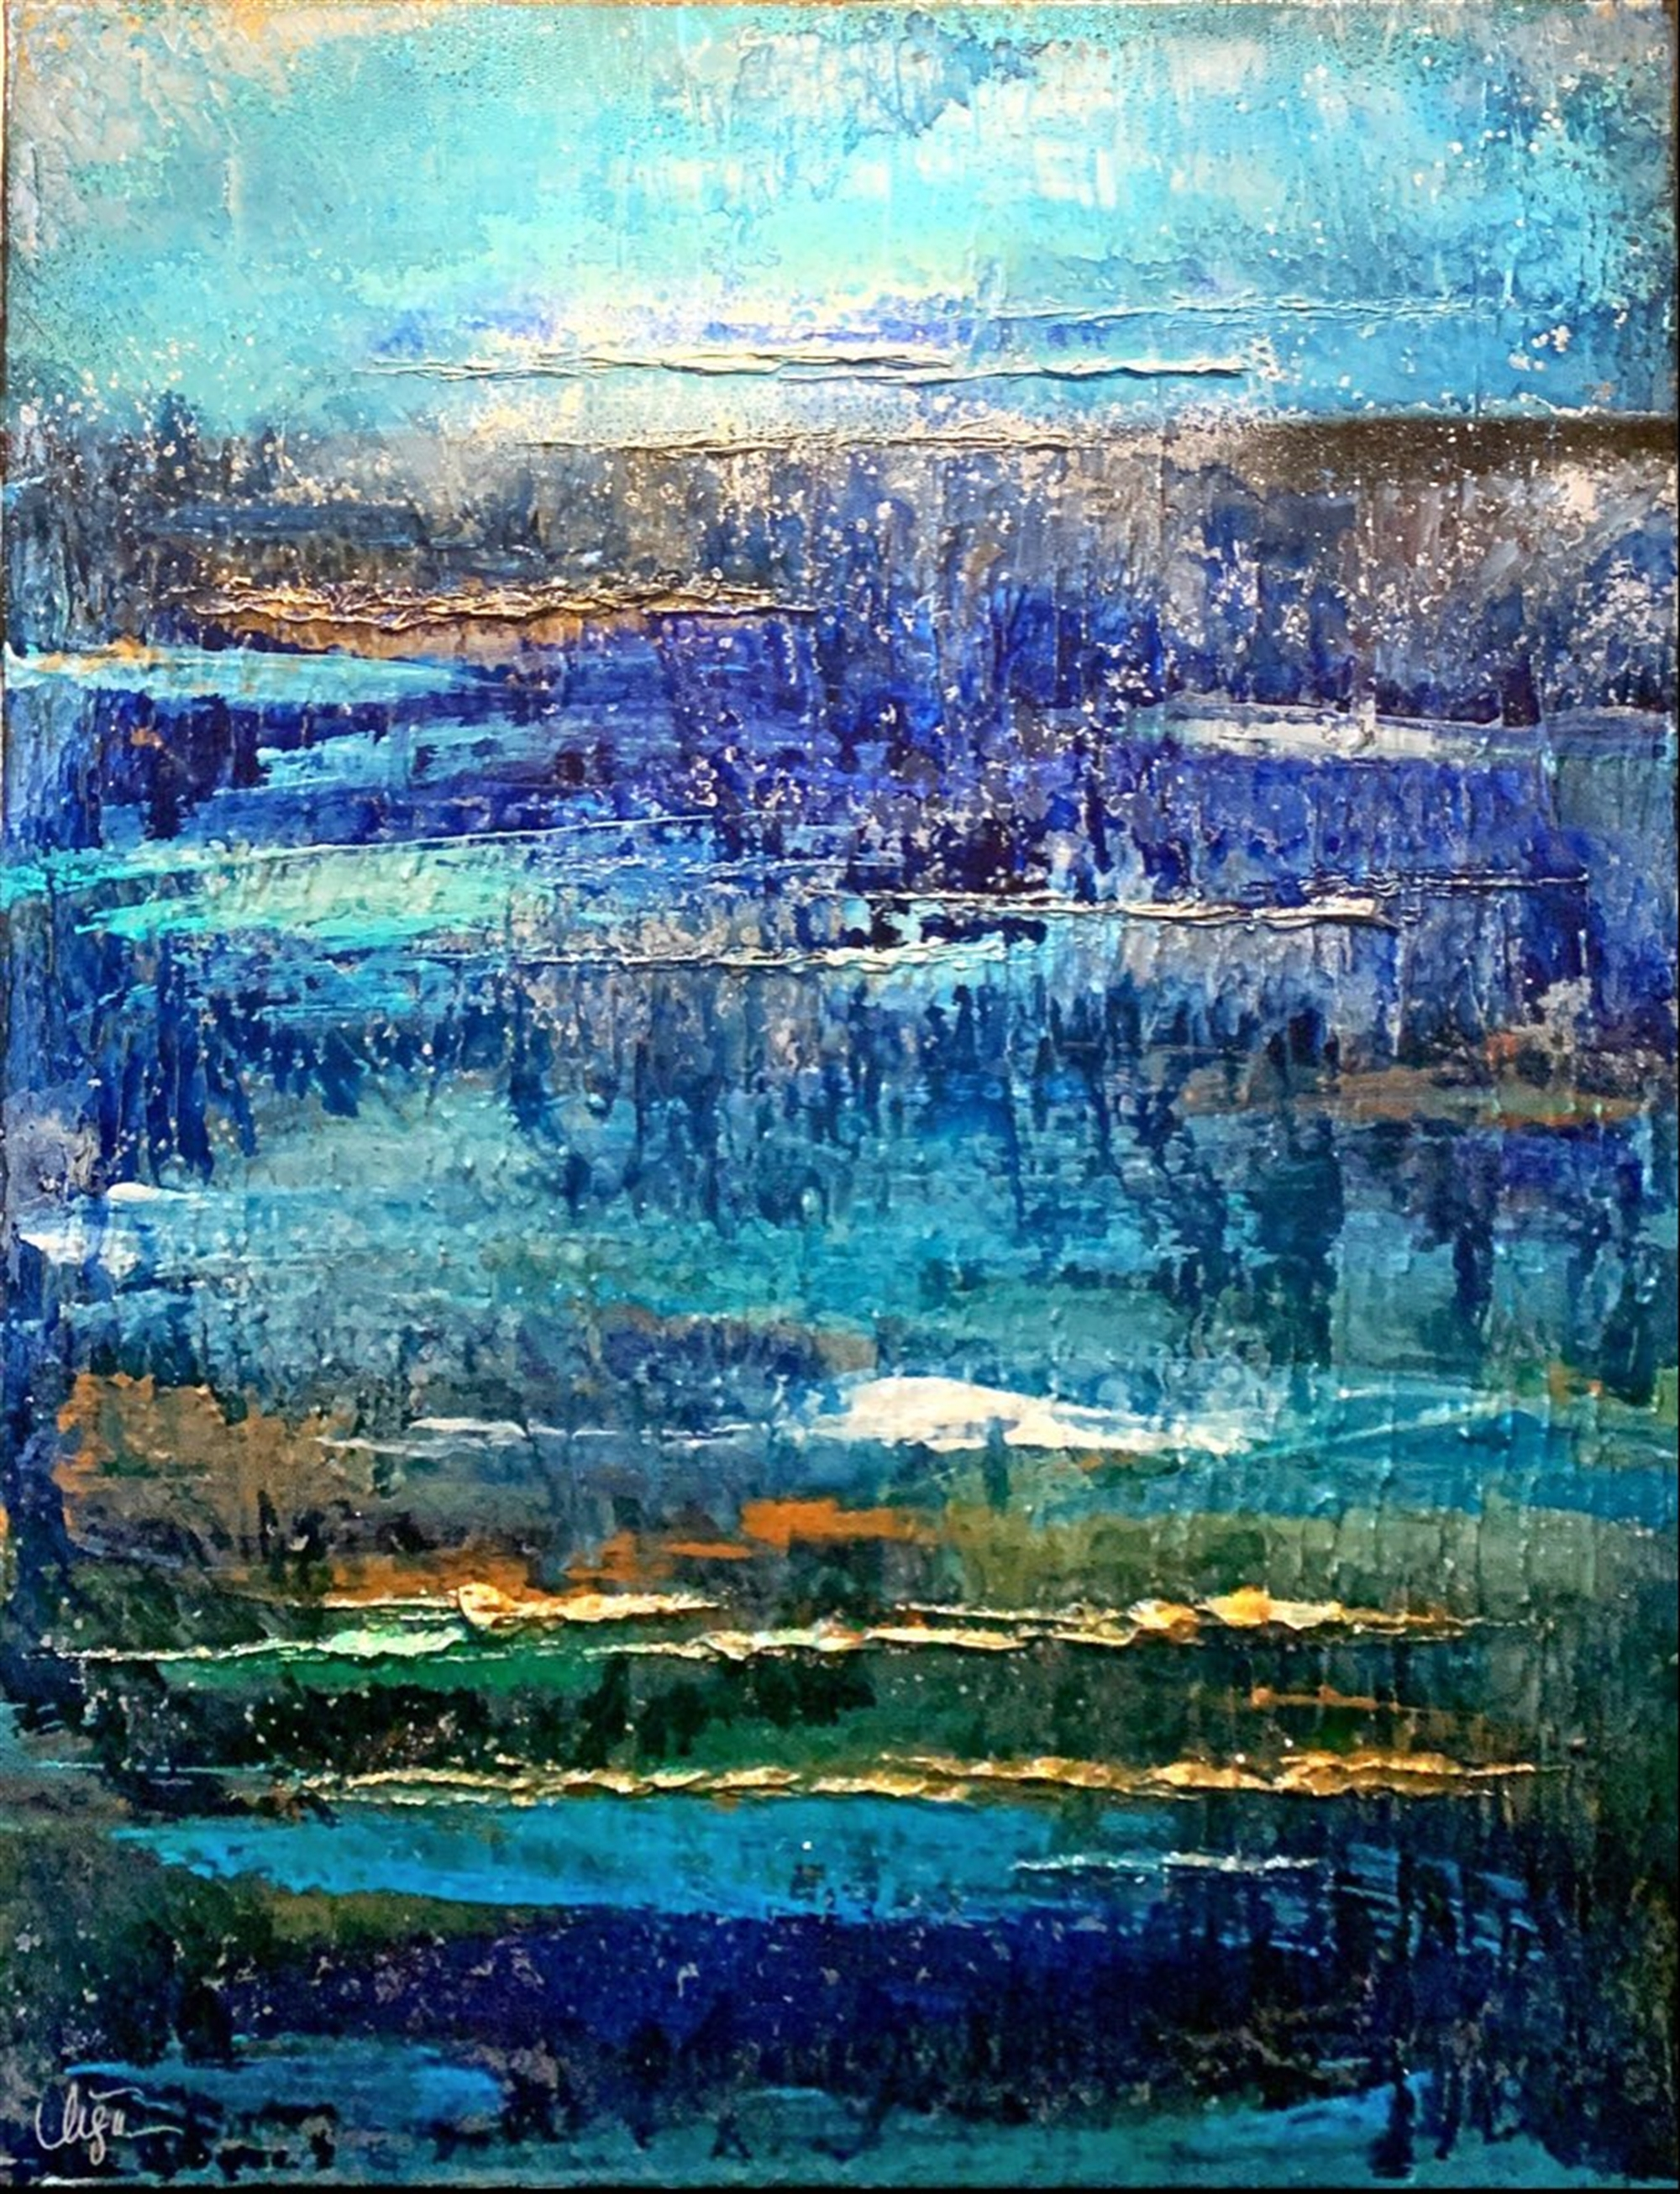 Beyond the Sea 1 by Lisa Wilson